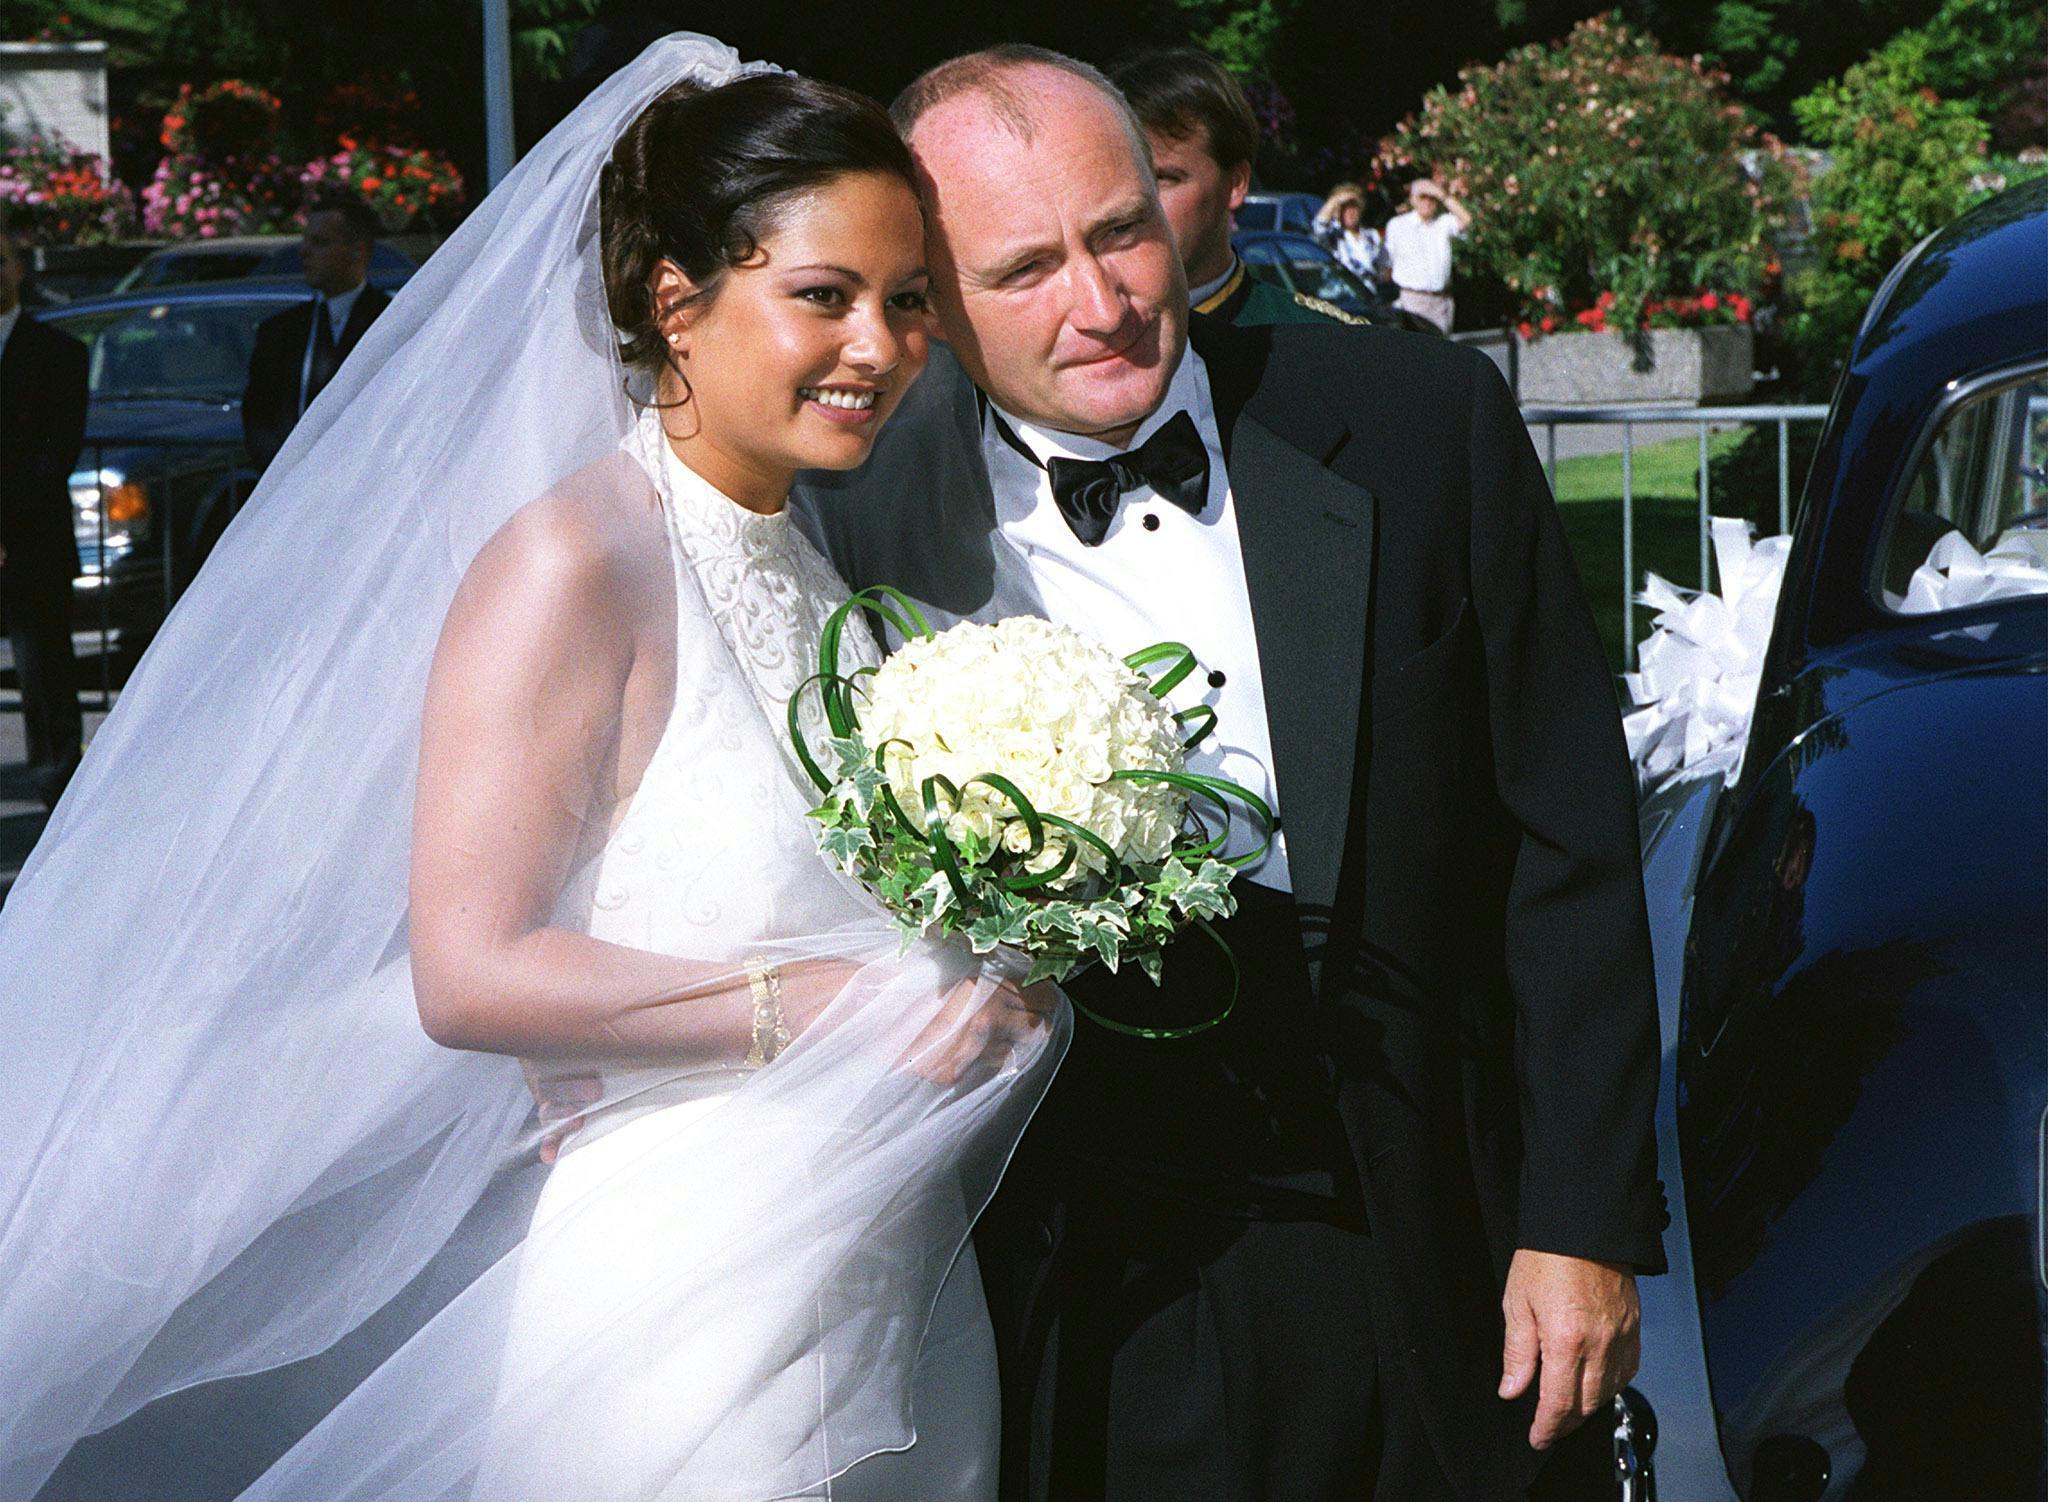 Orianne Cevey, Phil Collins